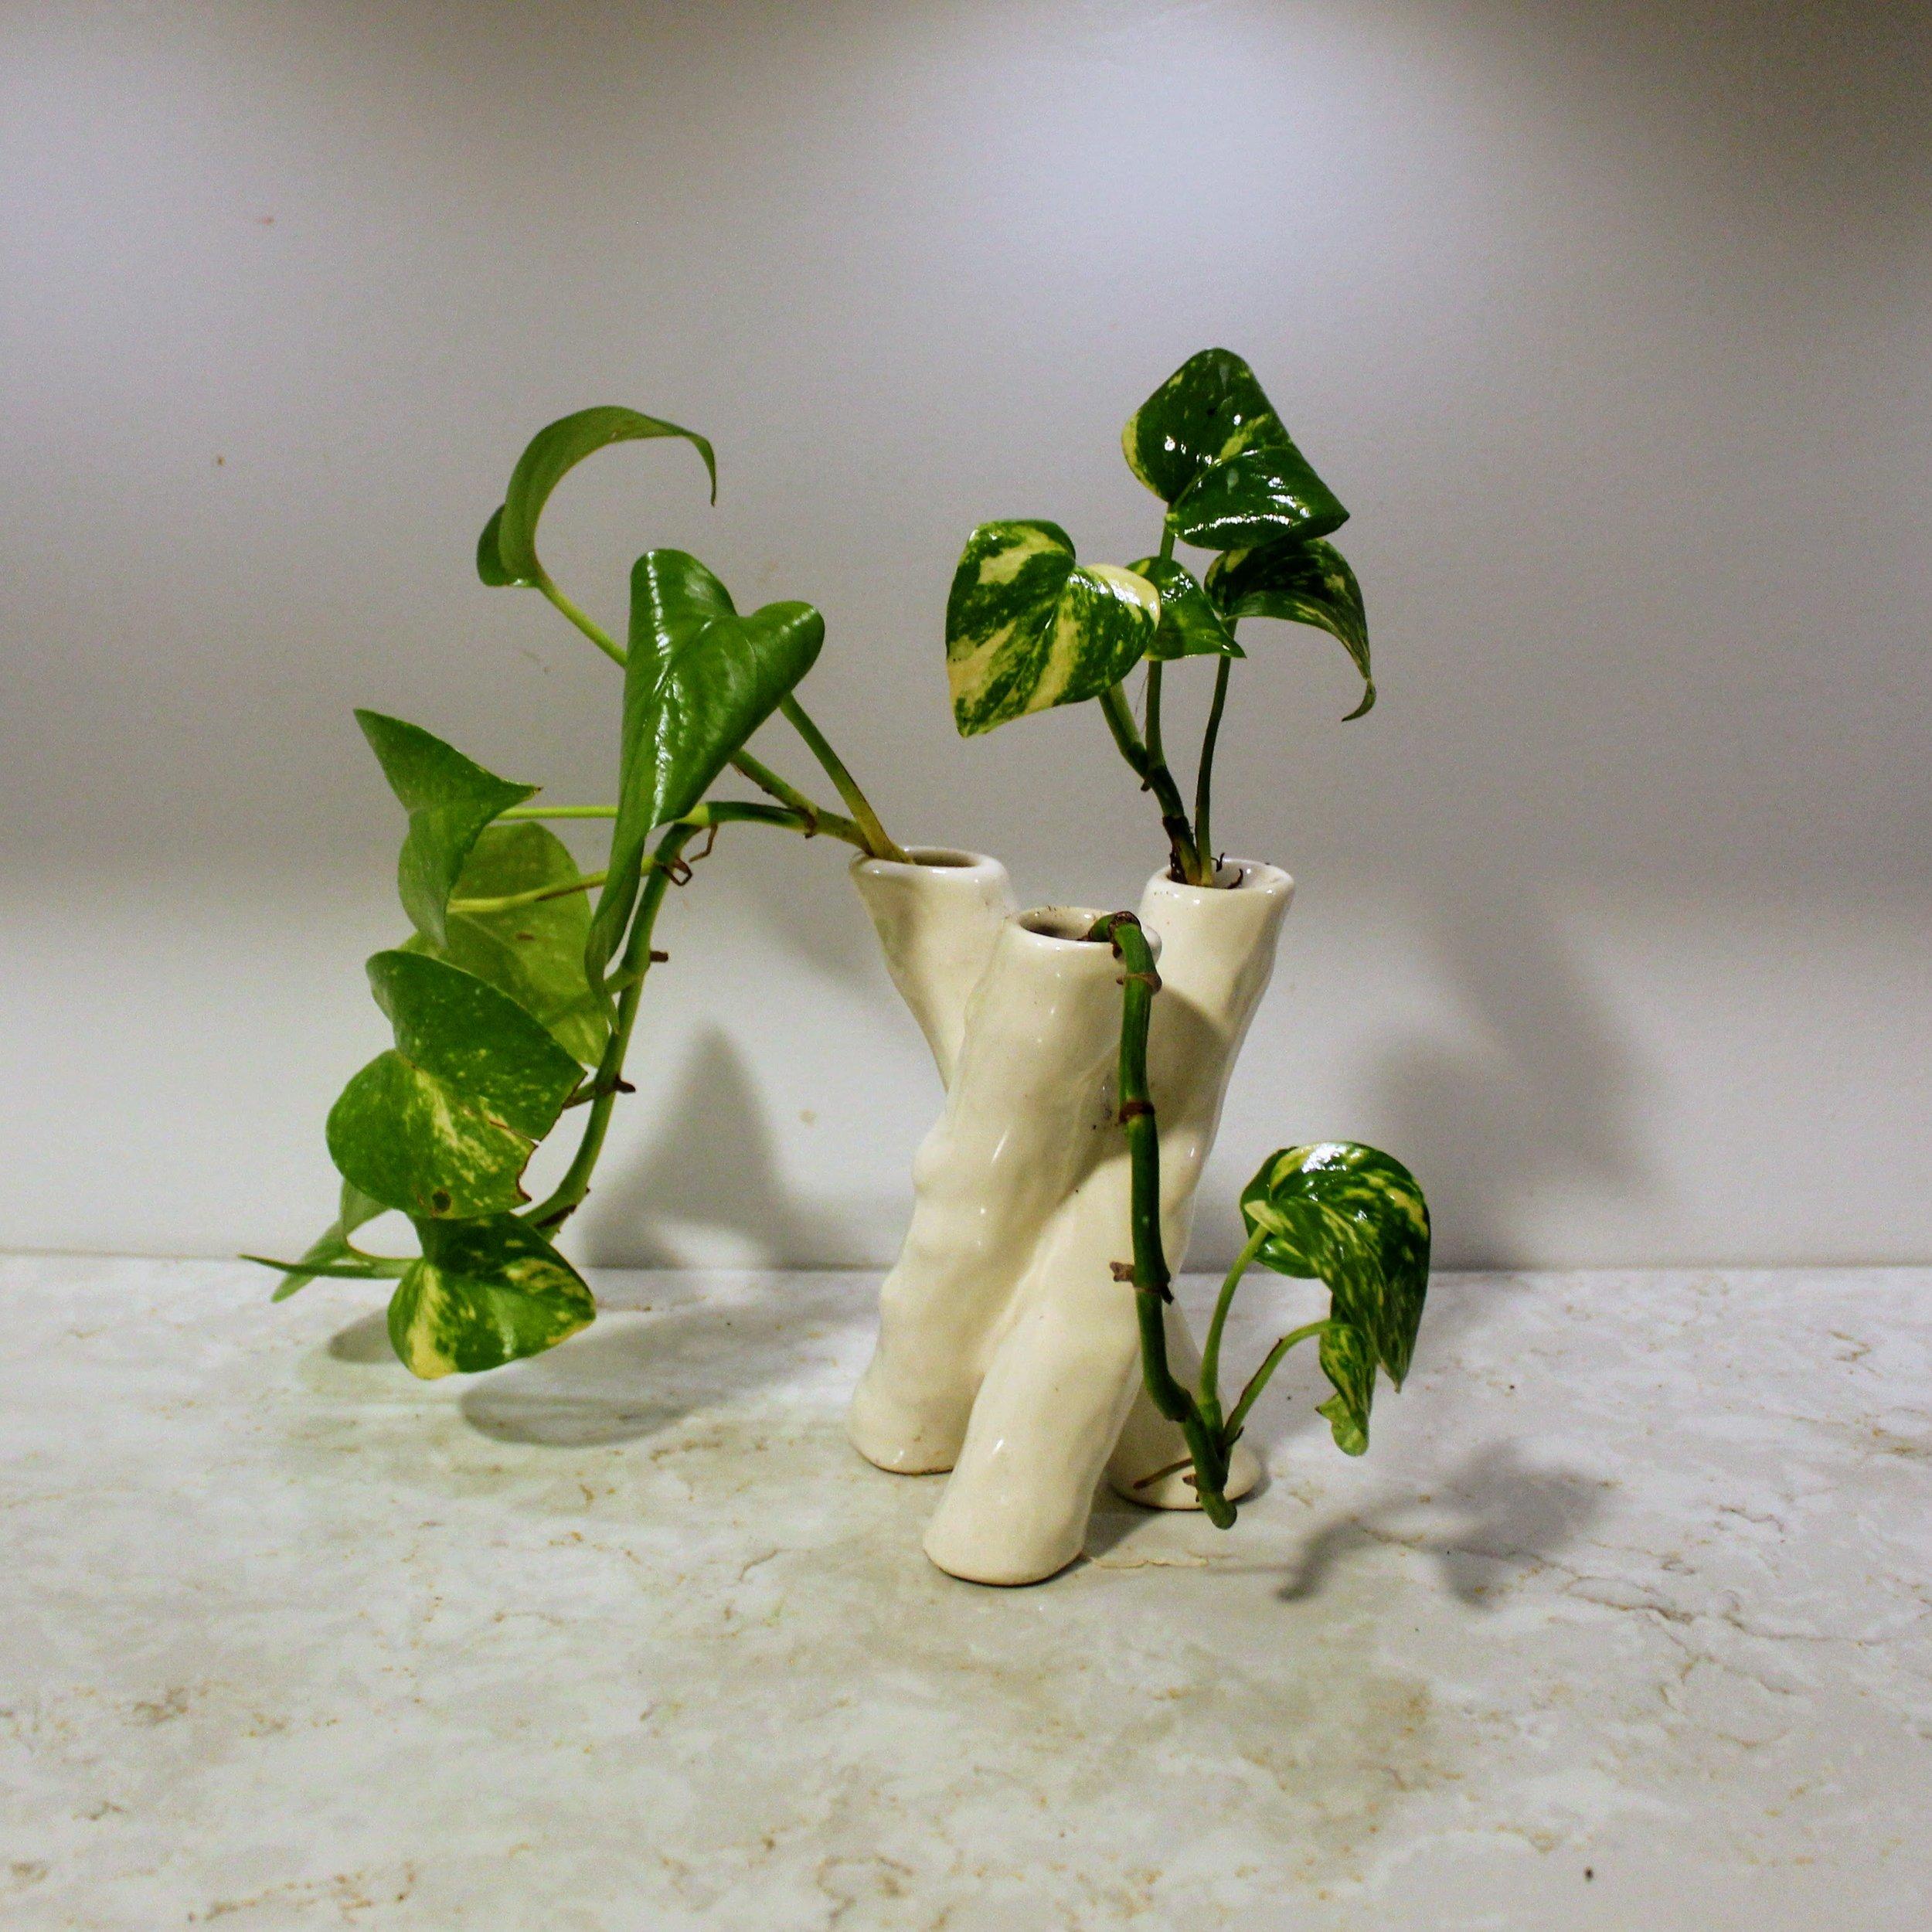 ninth ward nursery - potted plant3.jpg